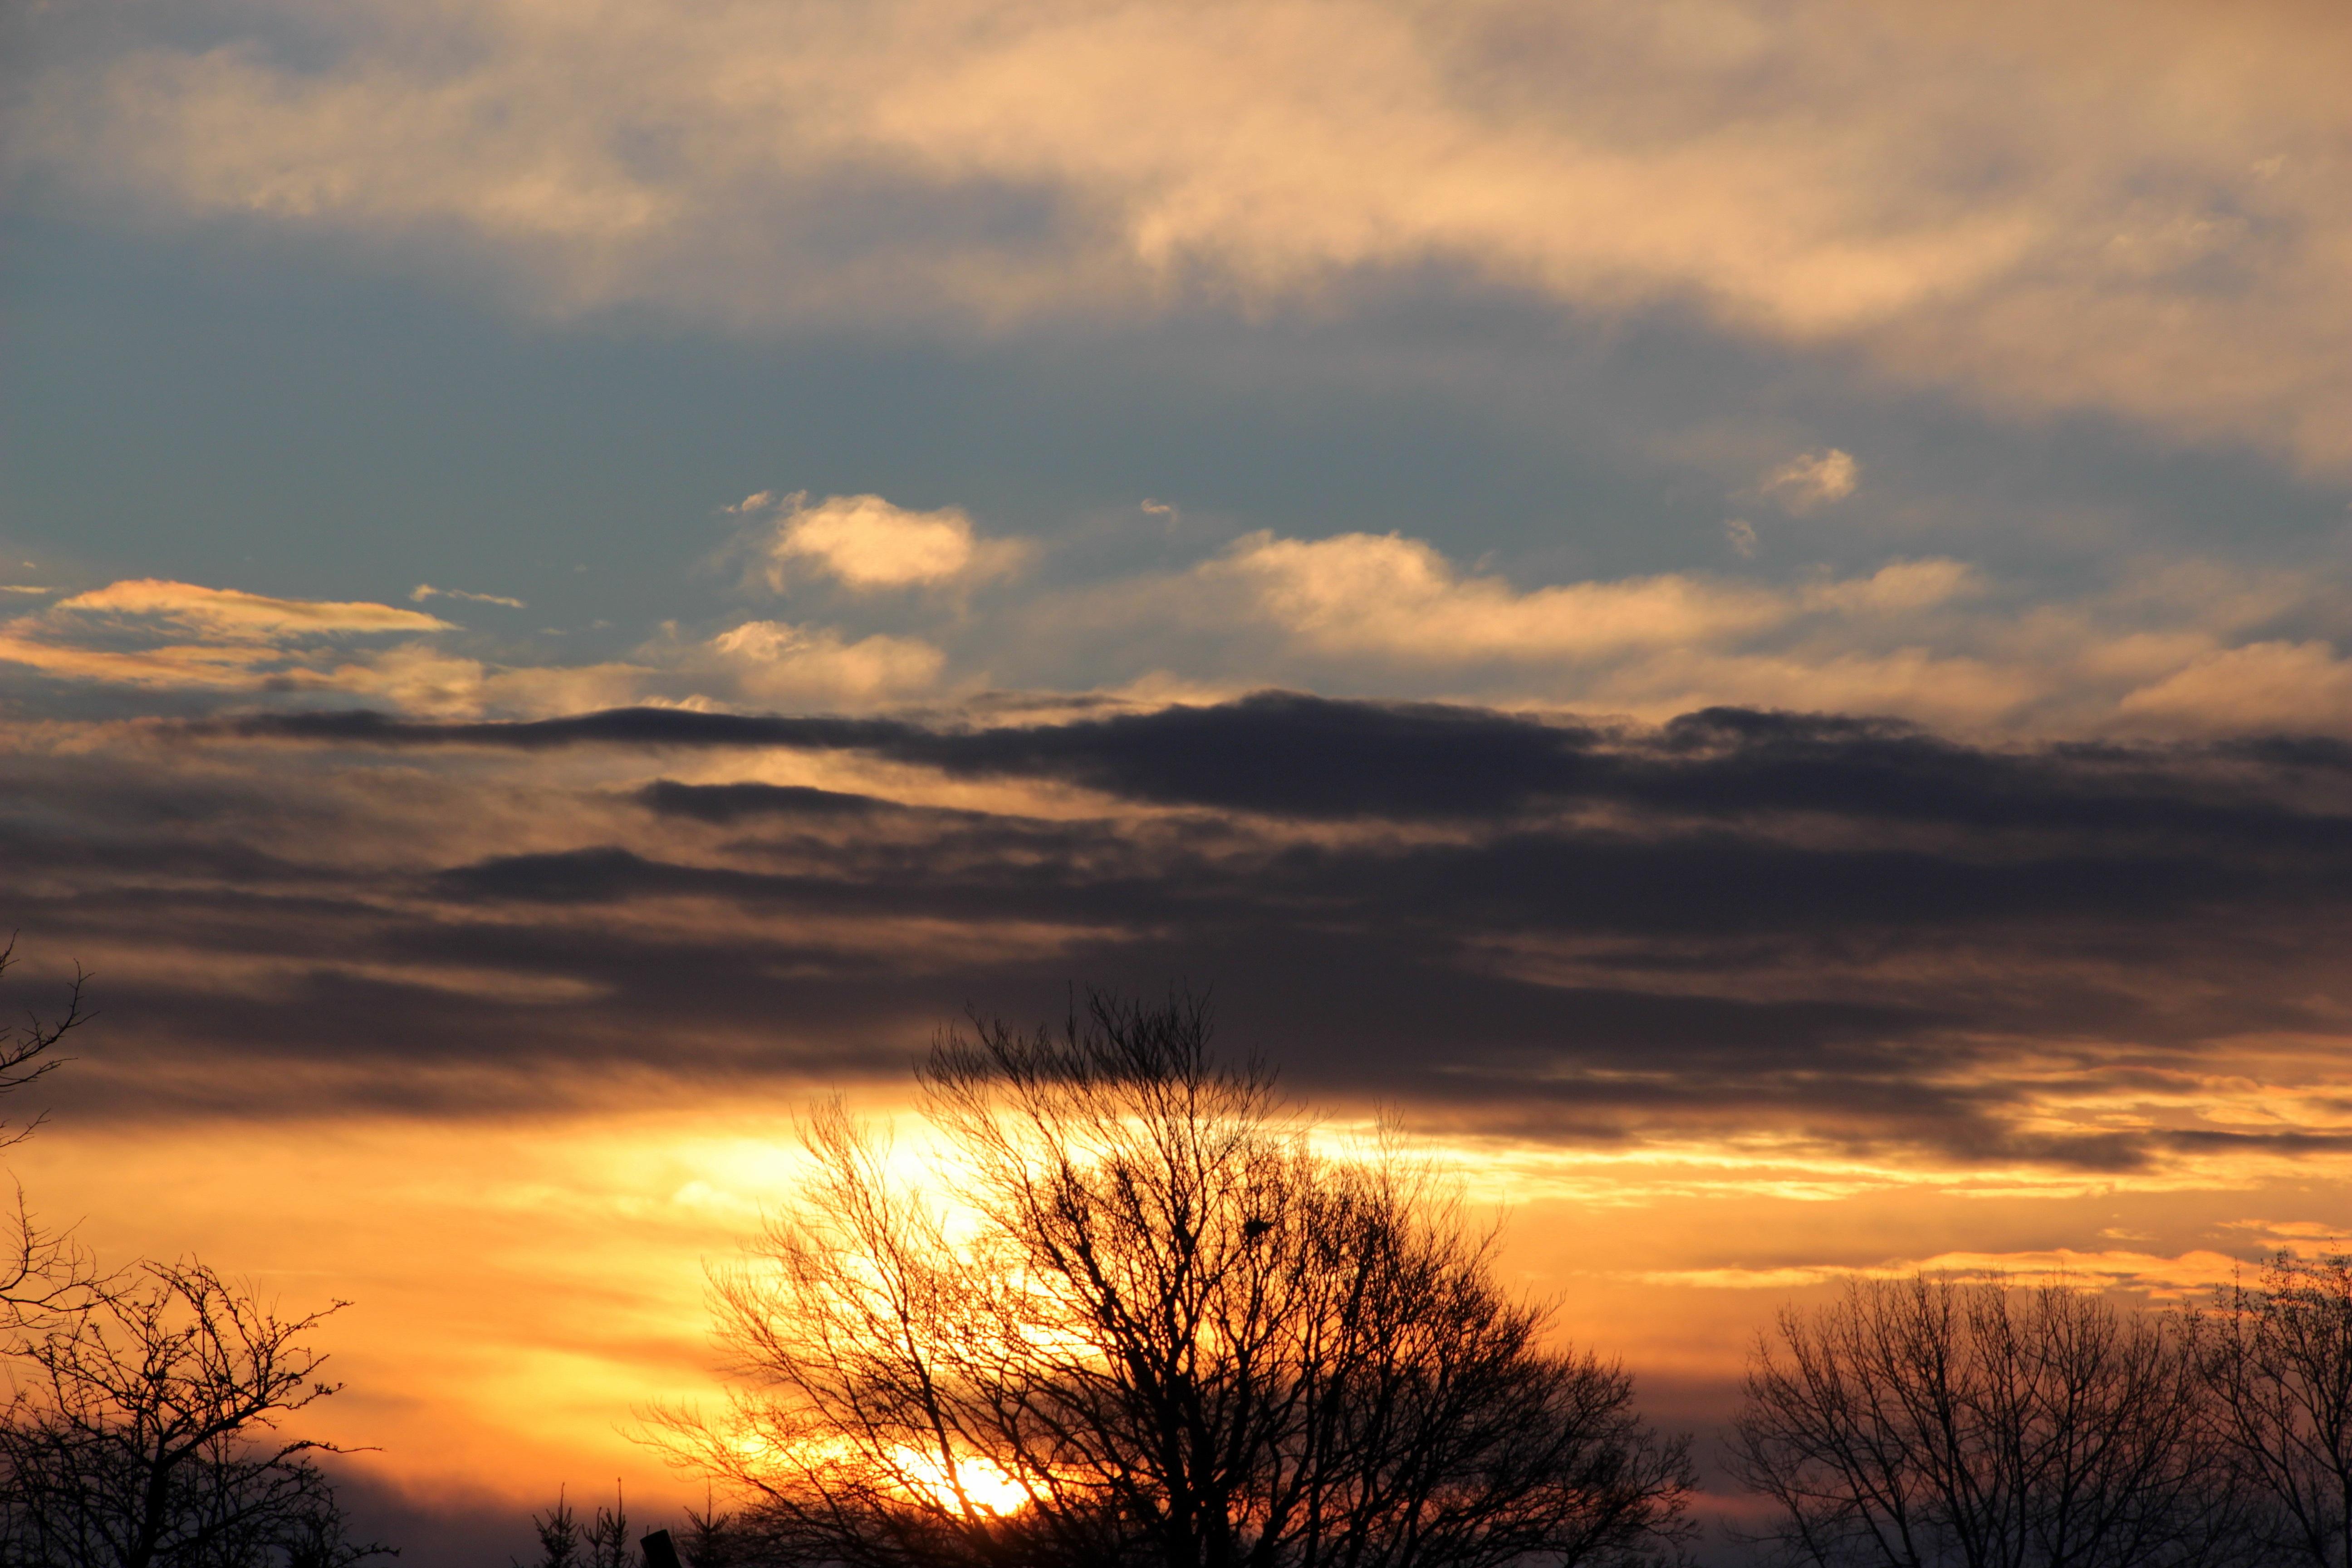 Trees Aesthetic Mood Morgenstimmung Awakening Afterglow Dark Clouds Morning Sun Good Meteorological Phenomenon Atmospheric